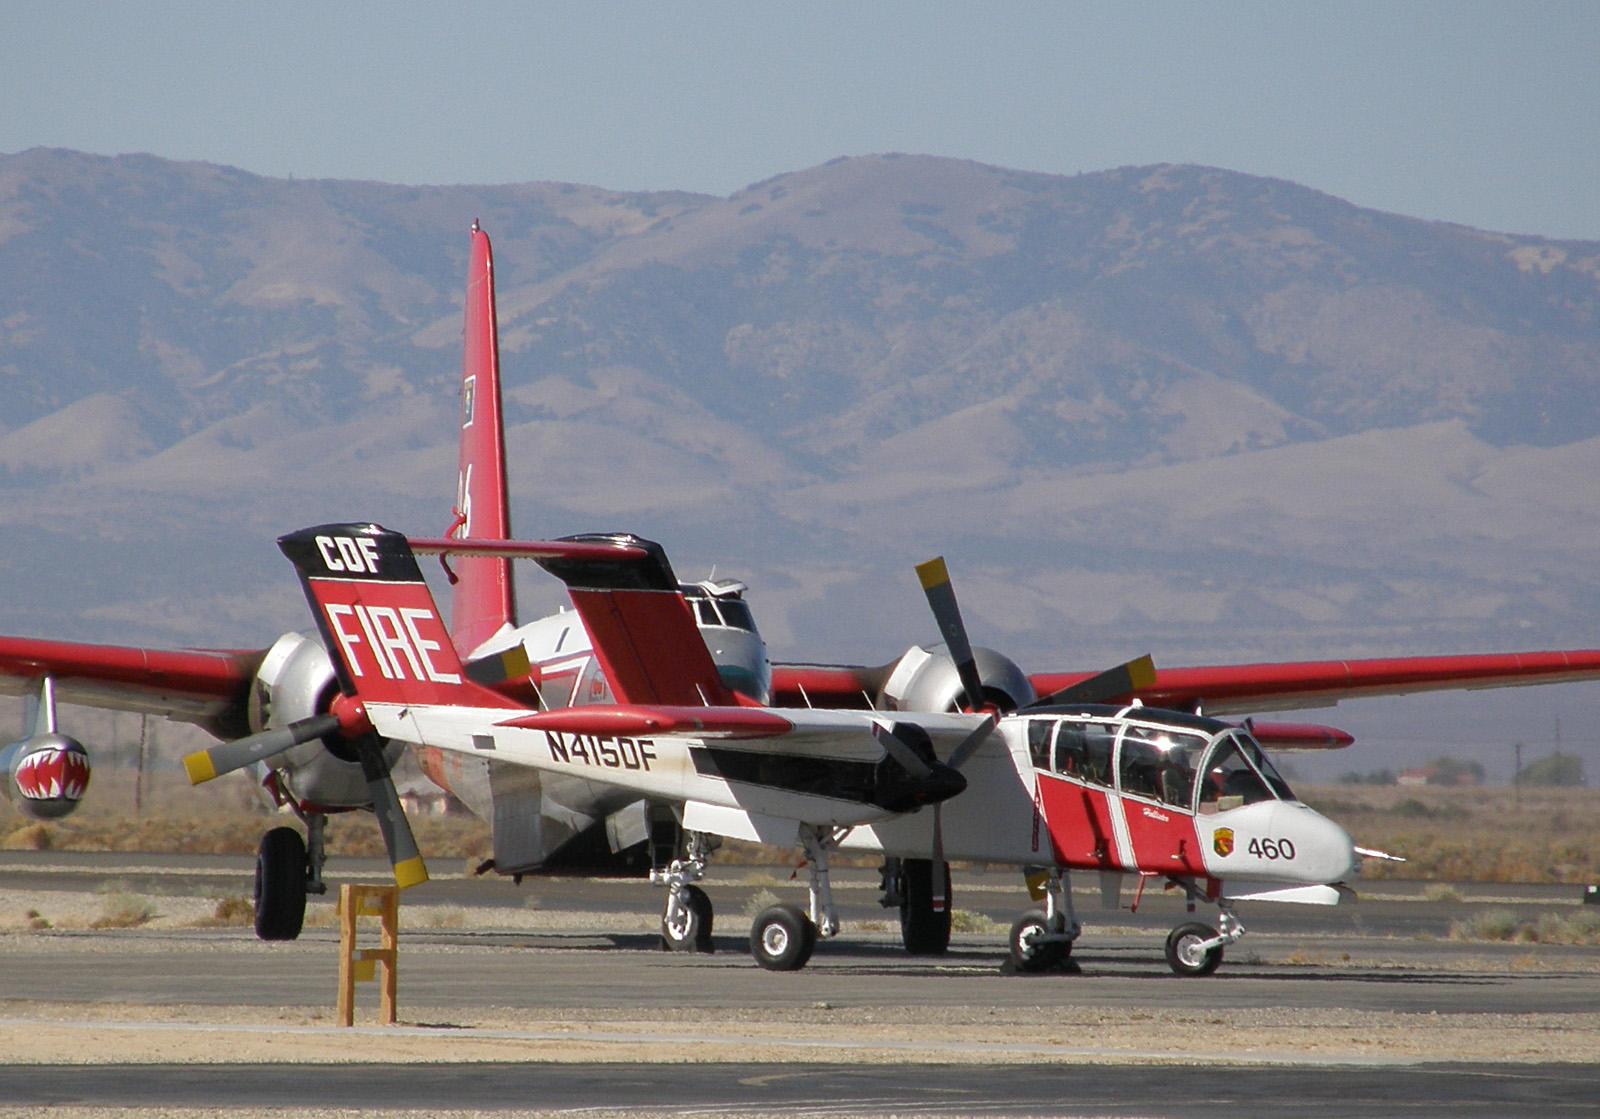 Air Attack Plane Air Attack 460 at Fox Field